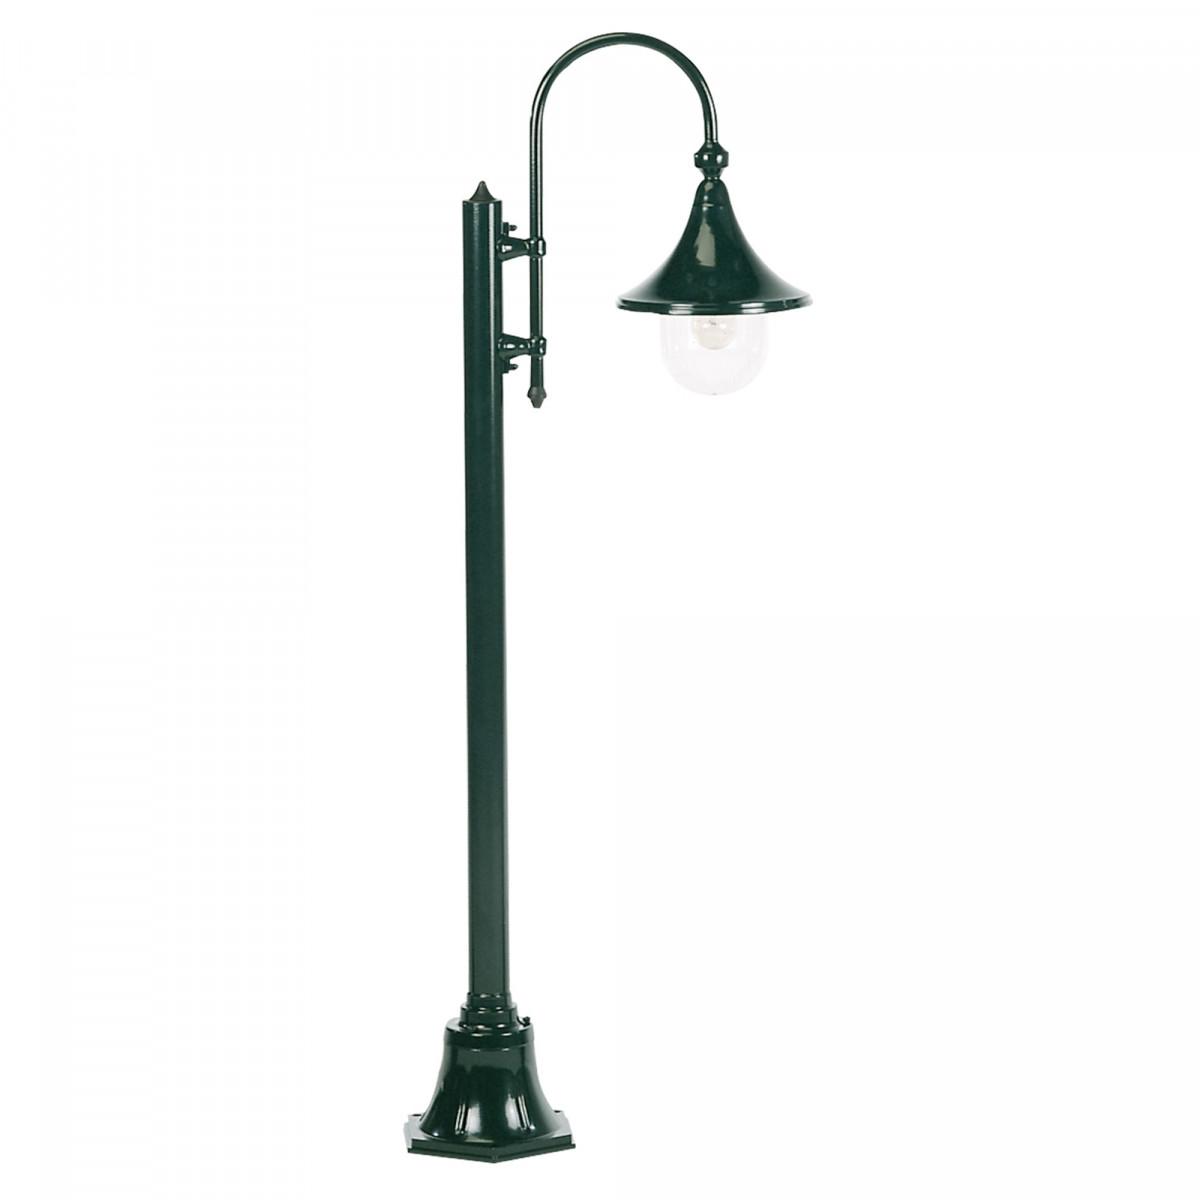 Rimini lantaarn (5046) - KS Verlichting - Semi Klassiek Landelijk